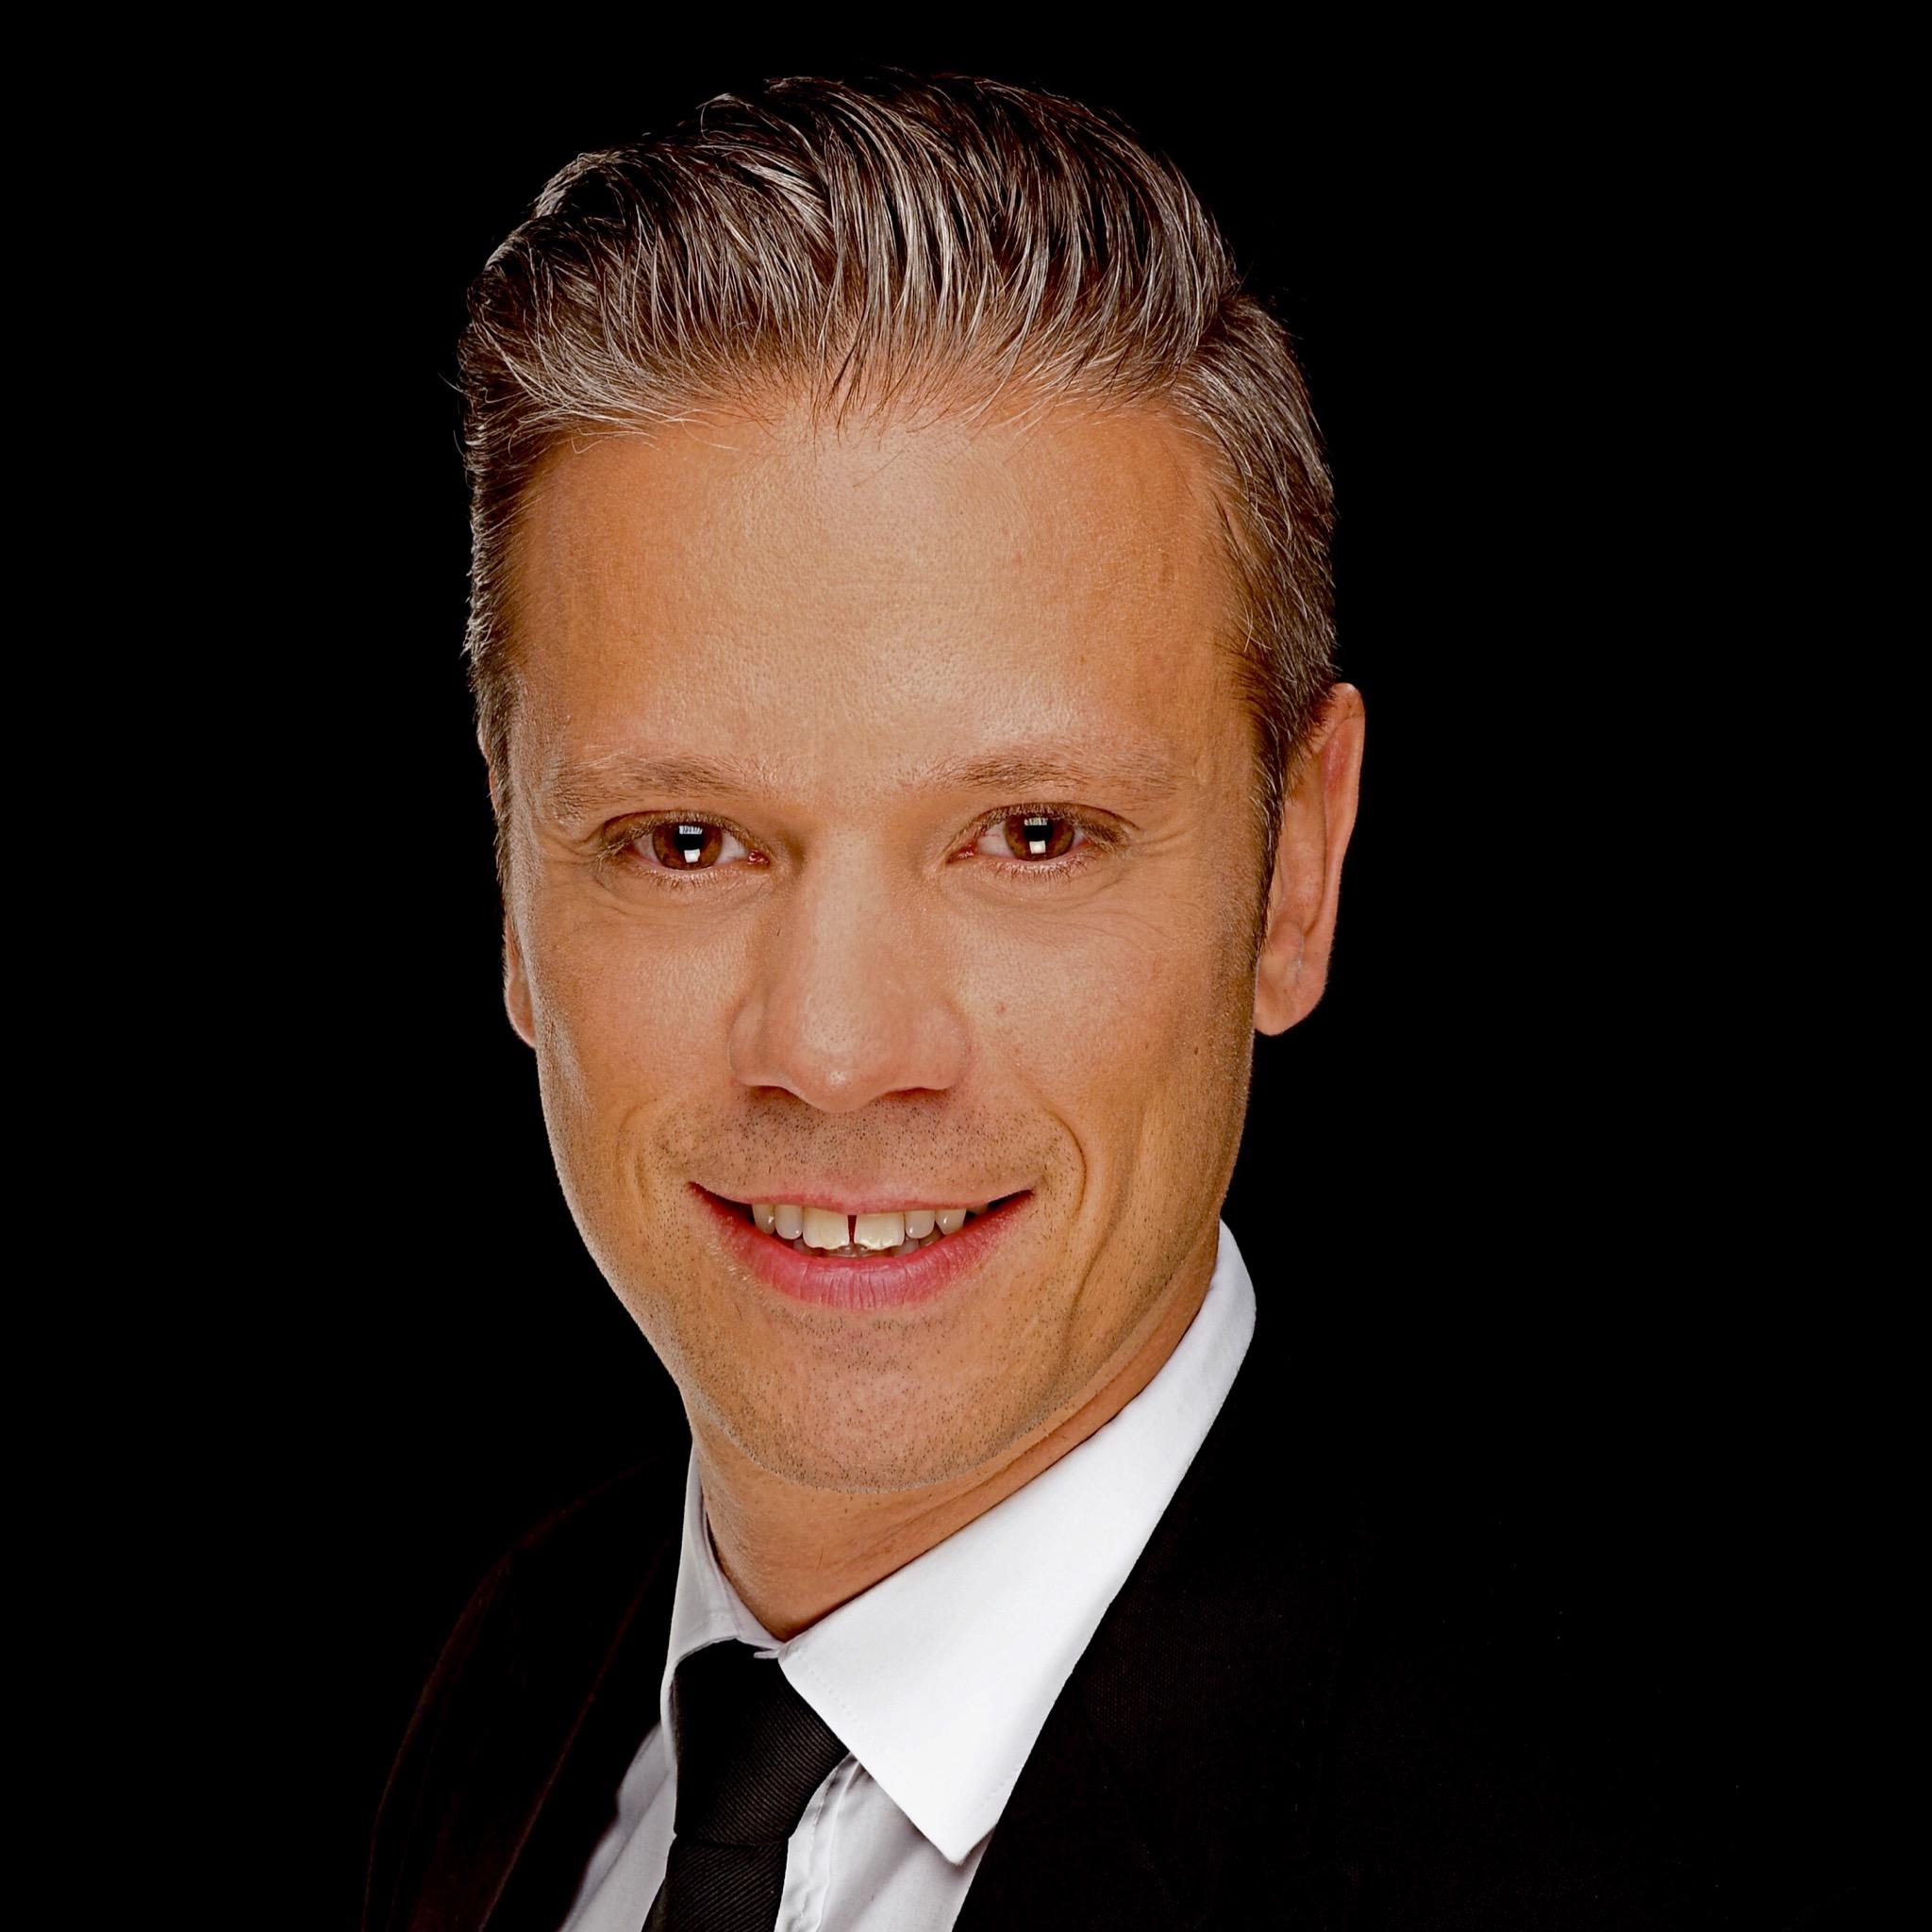 Unsere Tutoren: Andreas Laur